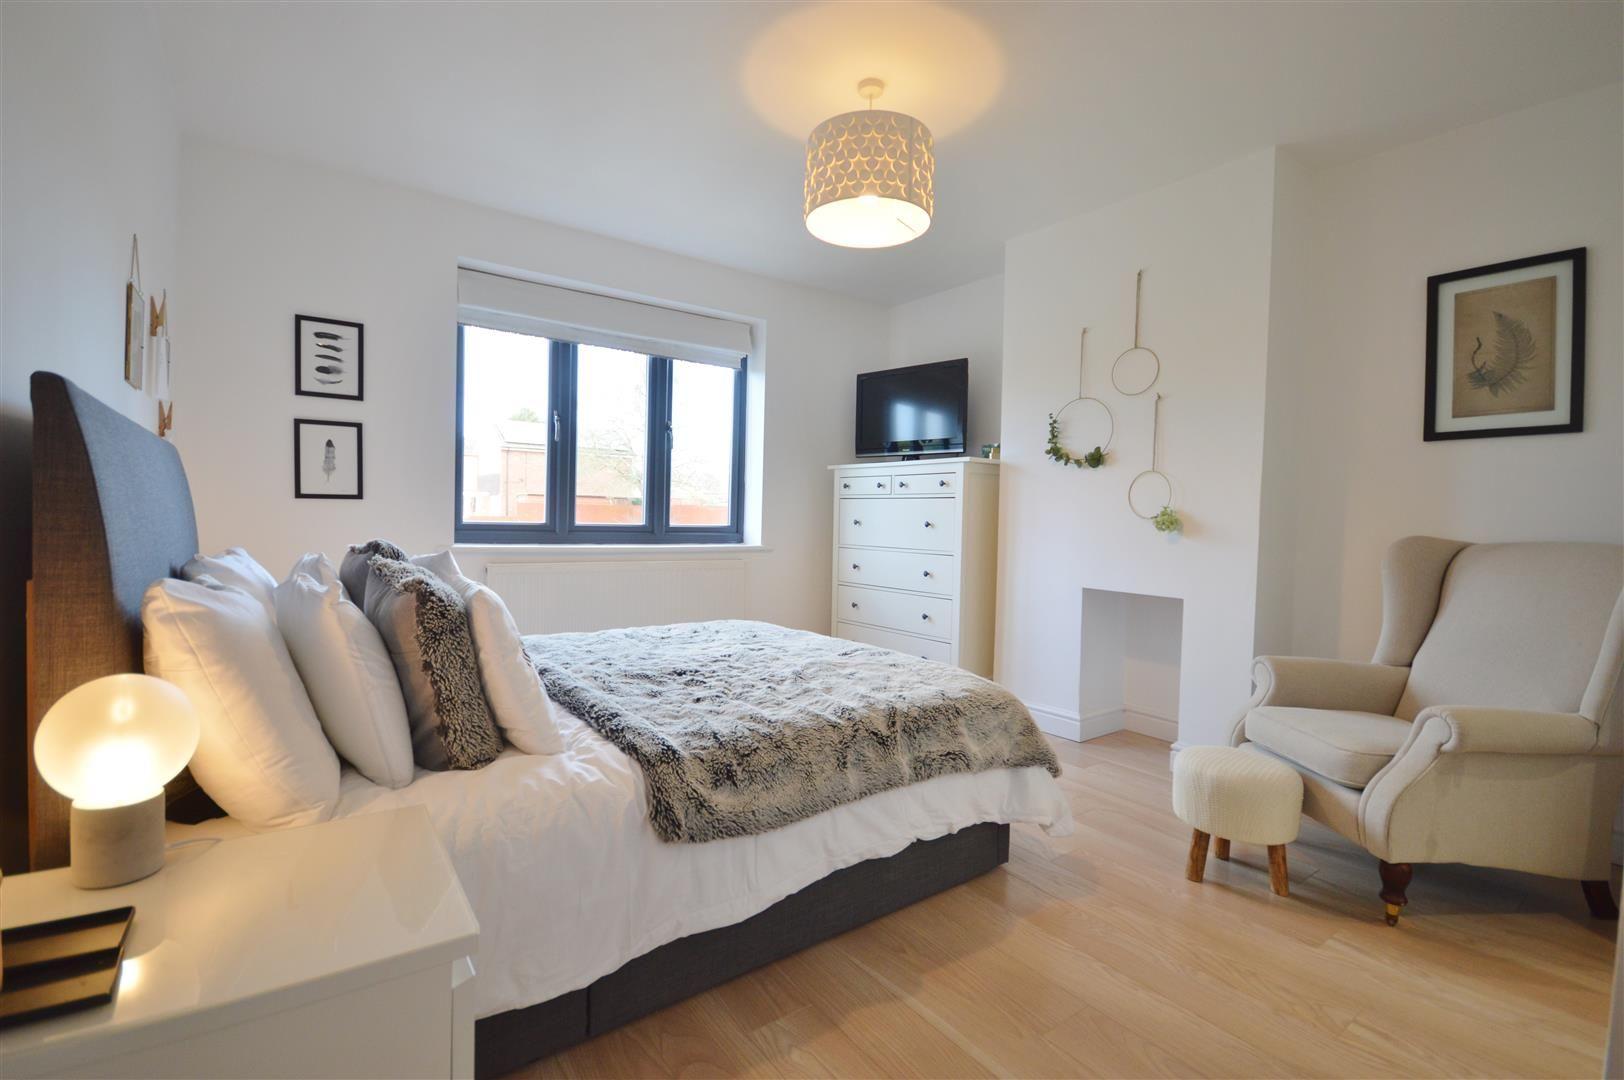 5 bed detached for sale in Leominster 10